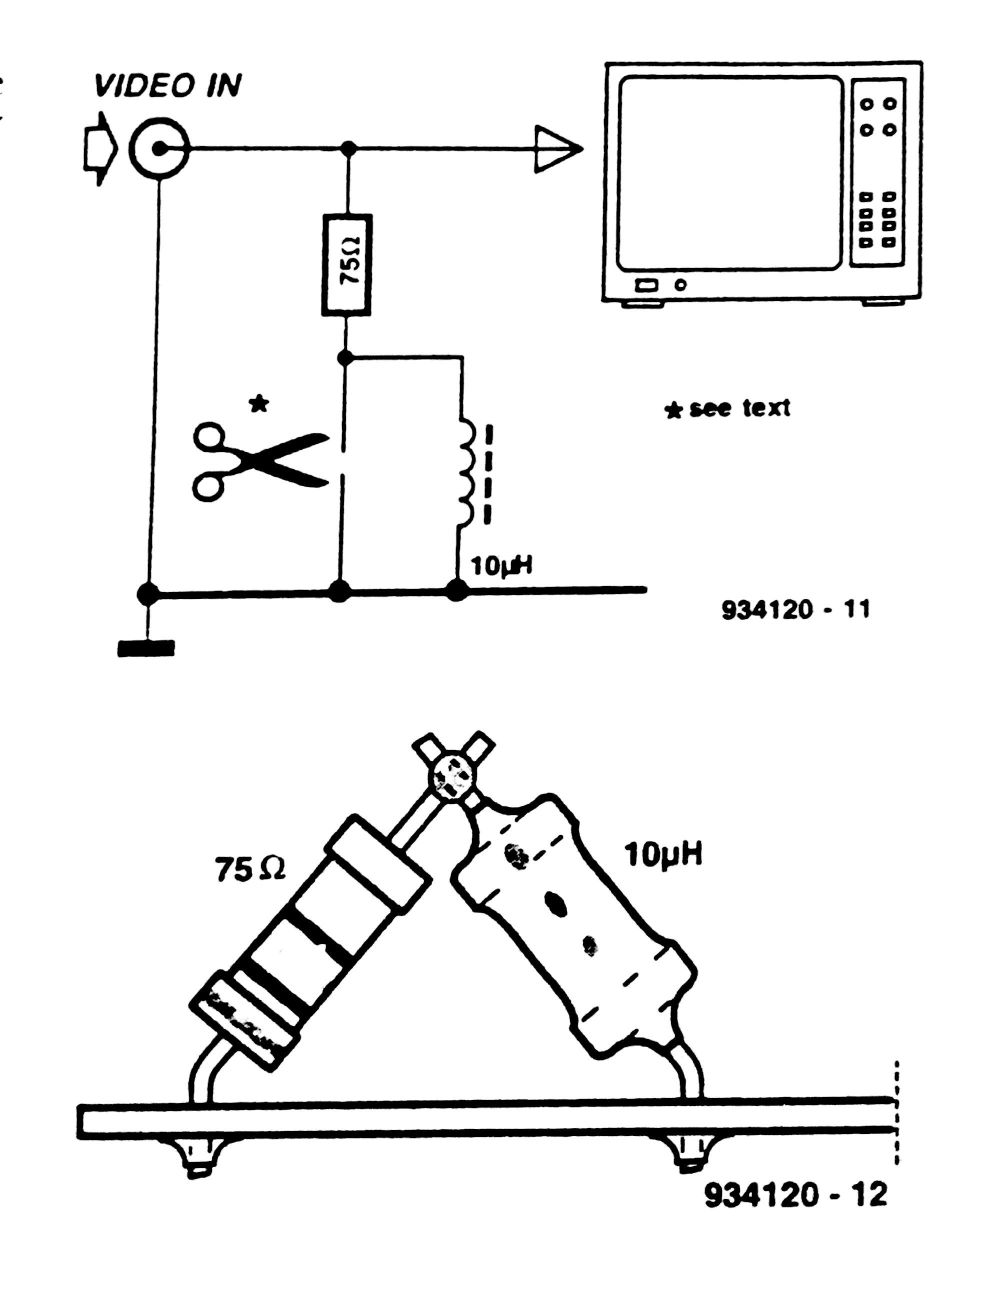 circuit diagram defined